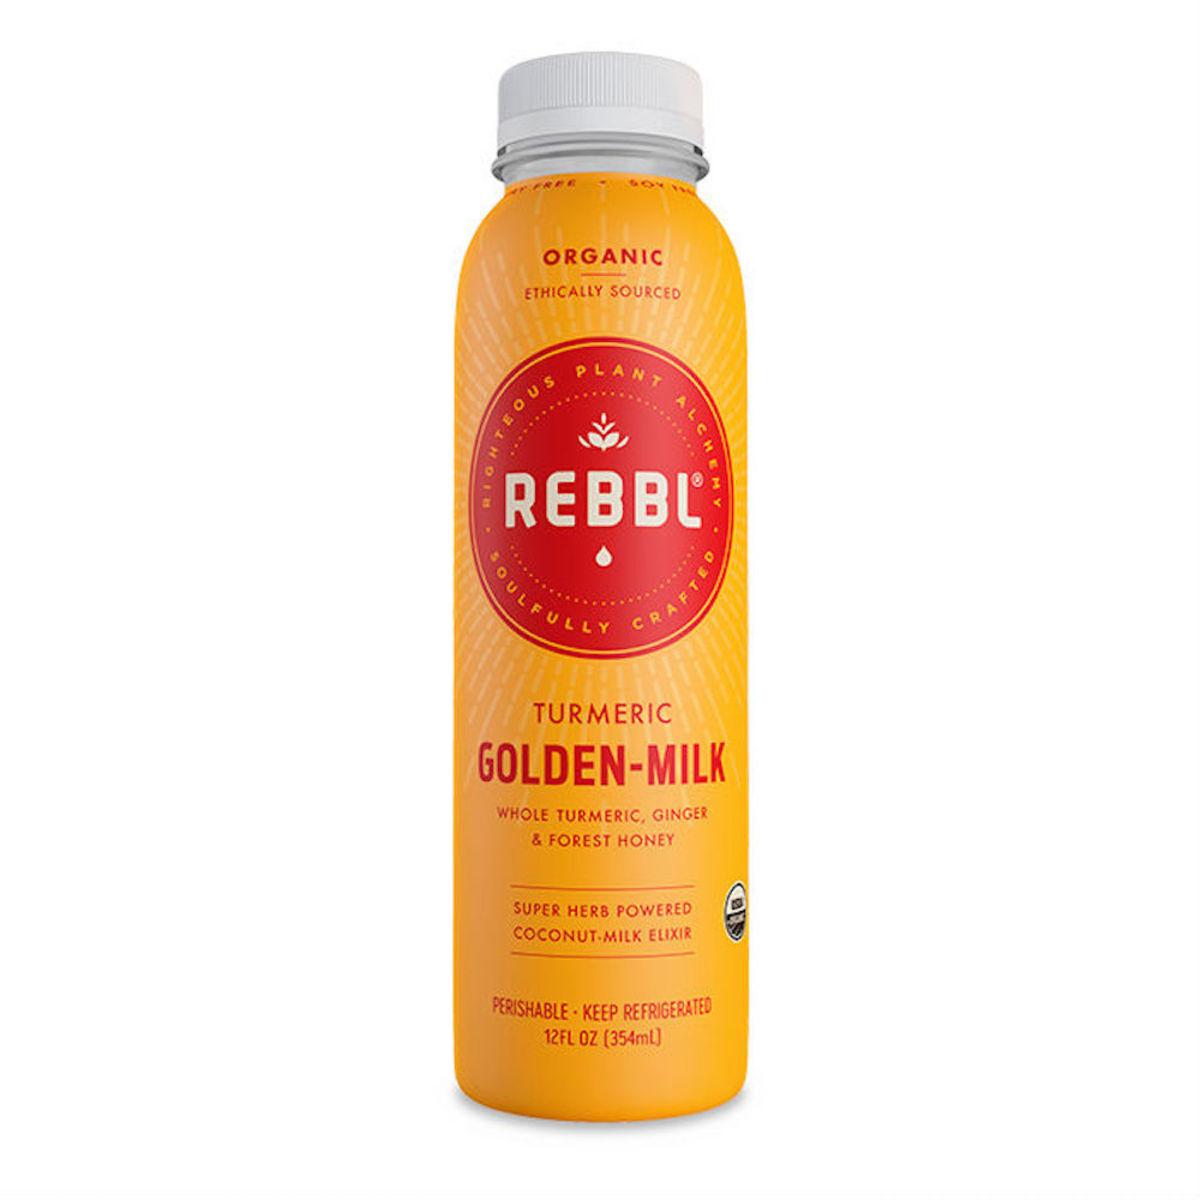 Rebbl-Turmeric-Golden